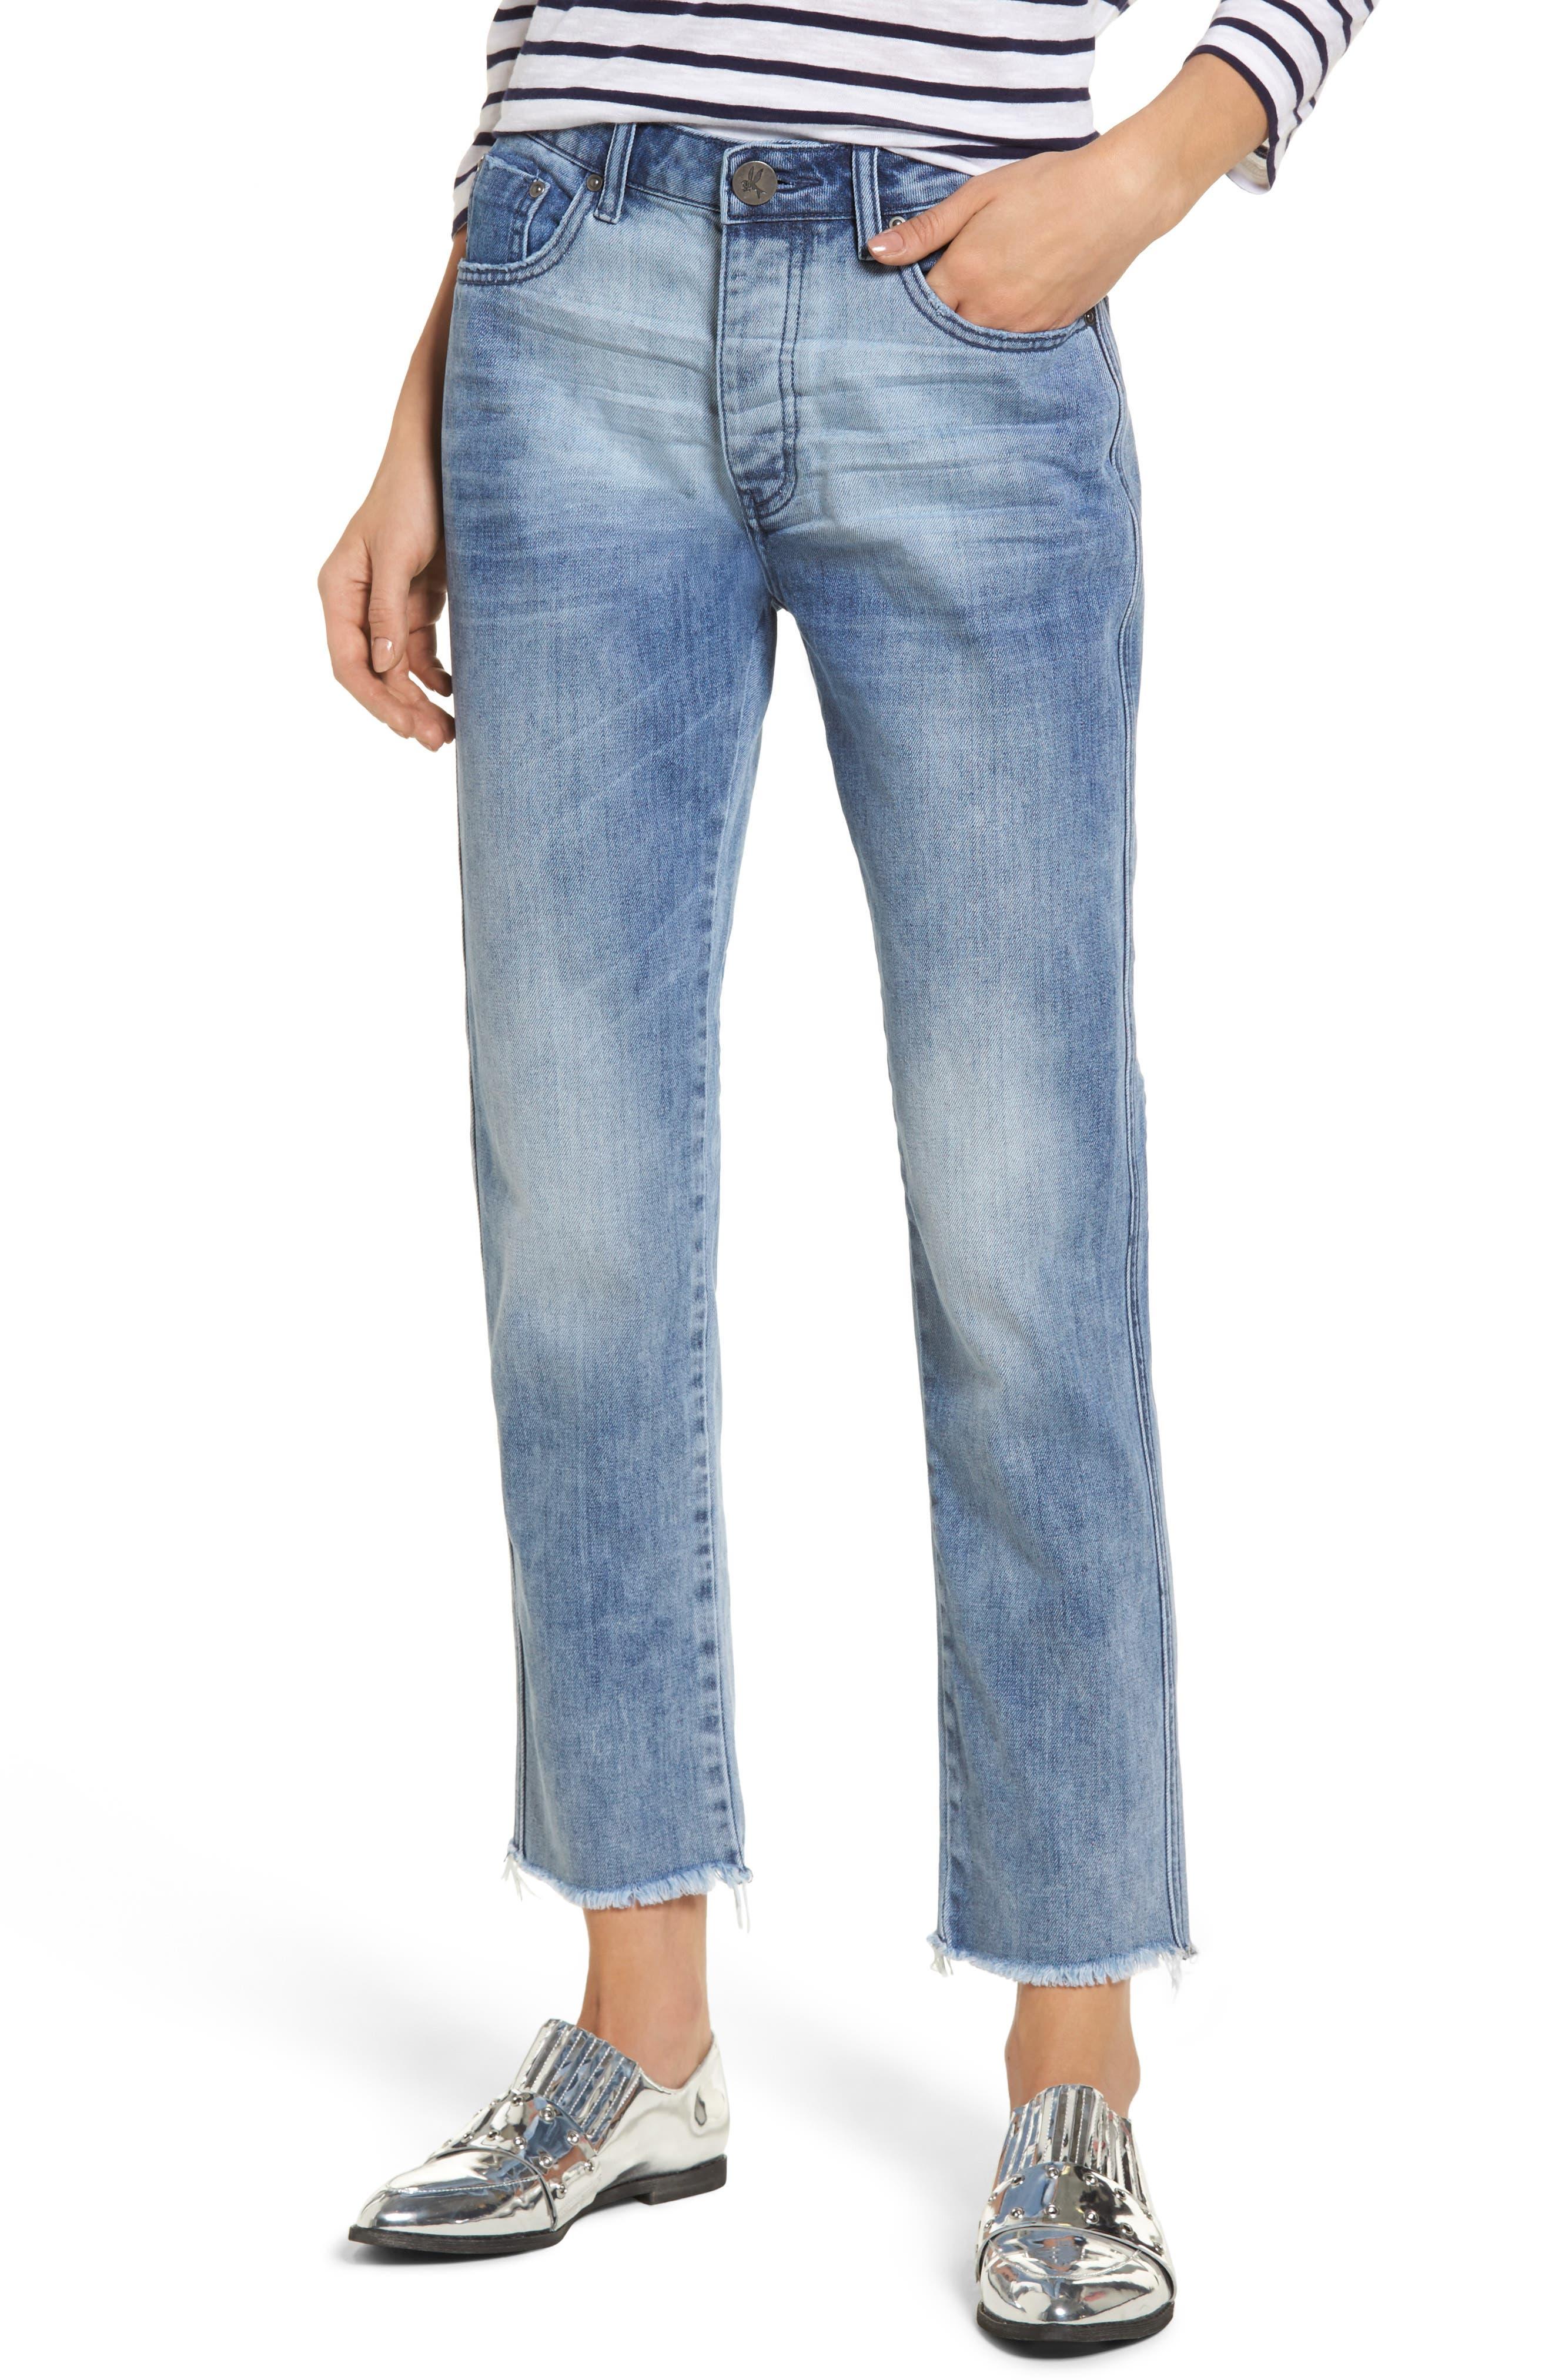 Main Image - One Teaspoon Tuckers High Waist Straight Leg Jeans